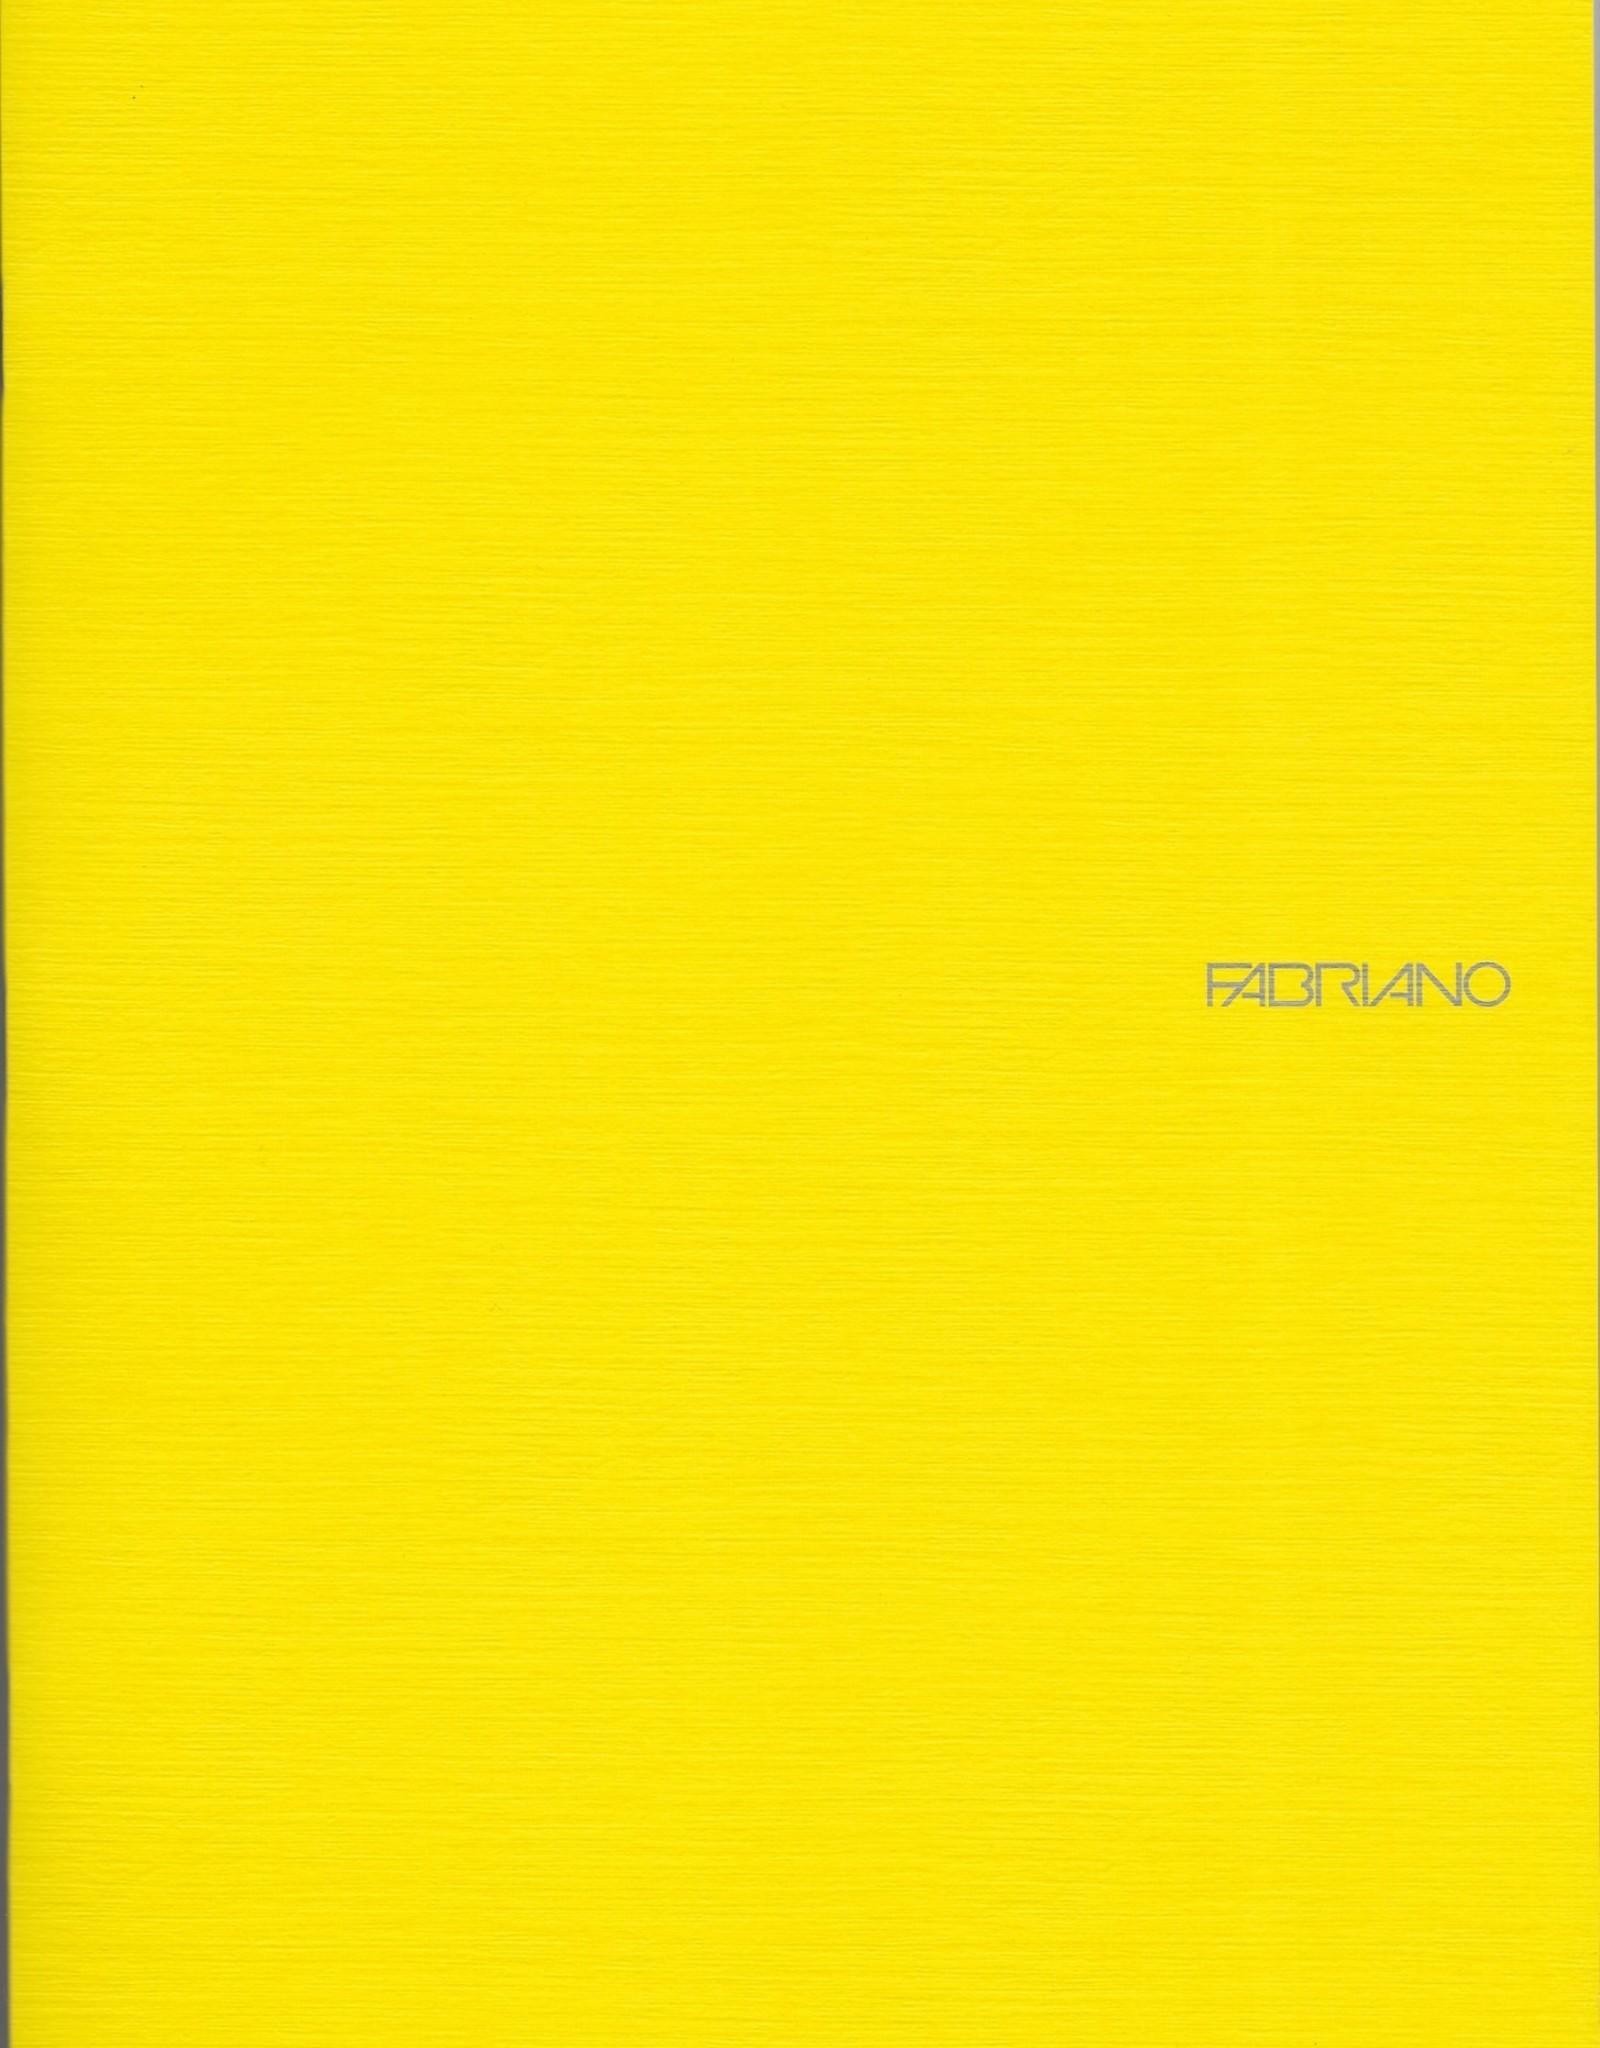 "Fabriano EcoQua Blank Notebook, Lemon, 8.25"" x 11.5"" 40 Sheets"